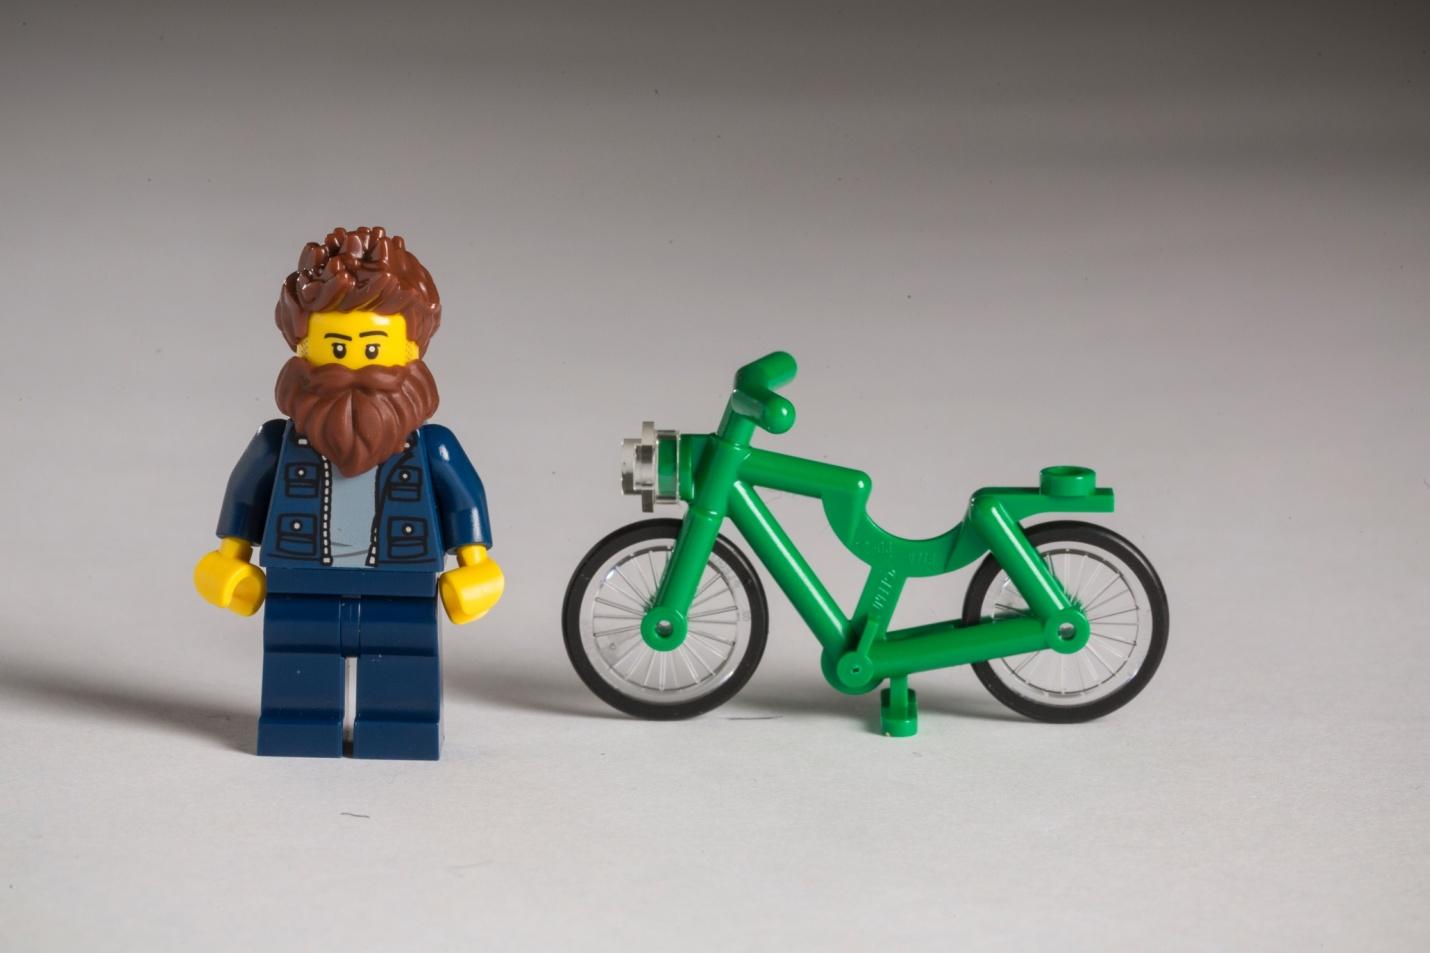 Hipster LEGO avec son vélo (fixie)